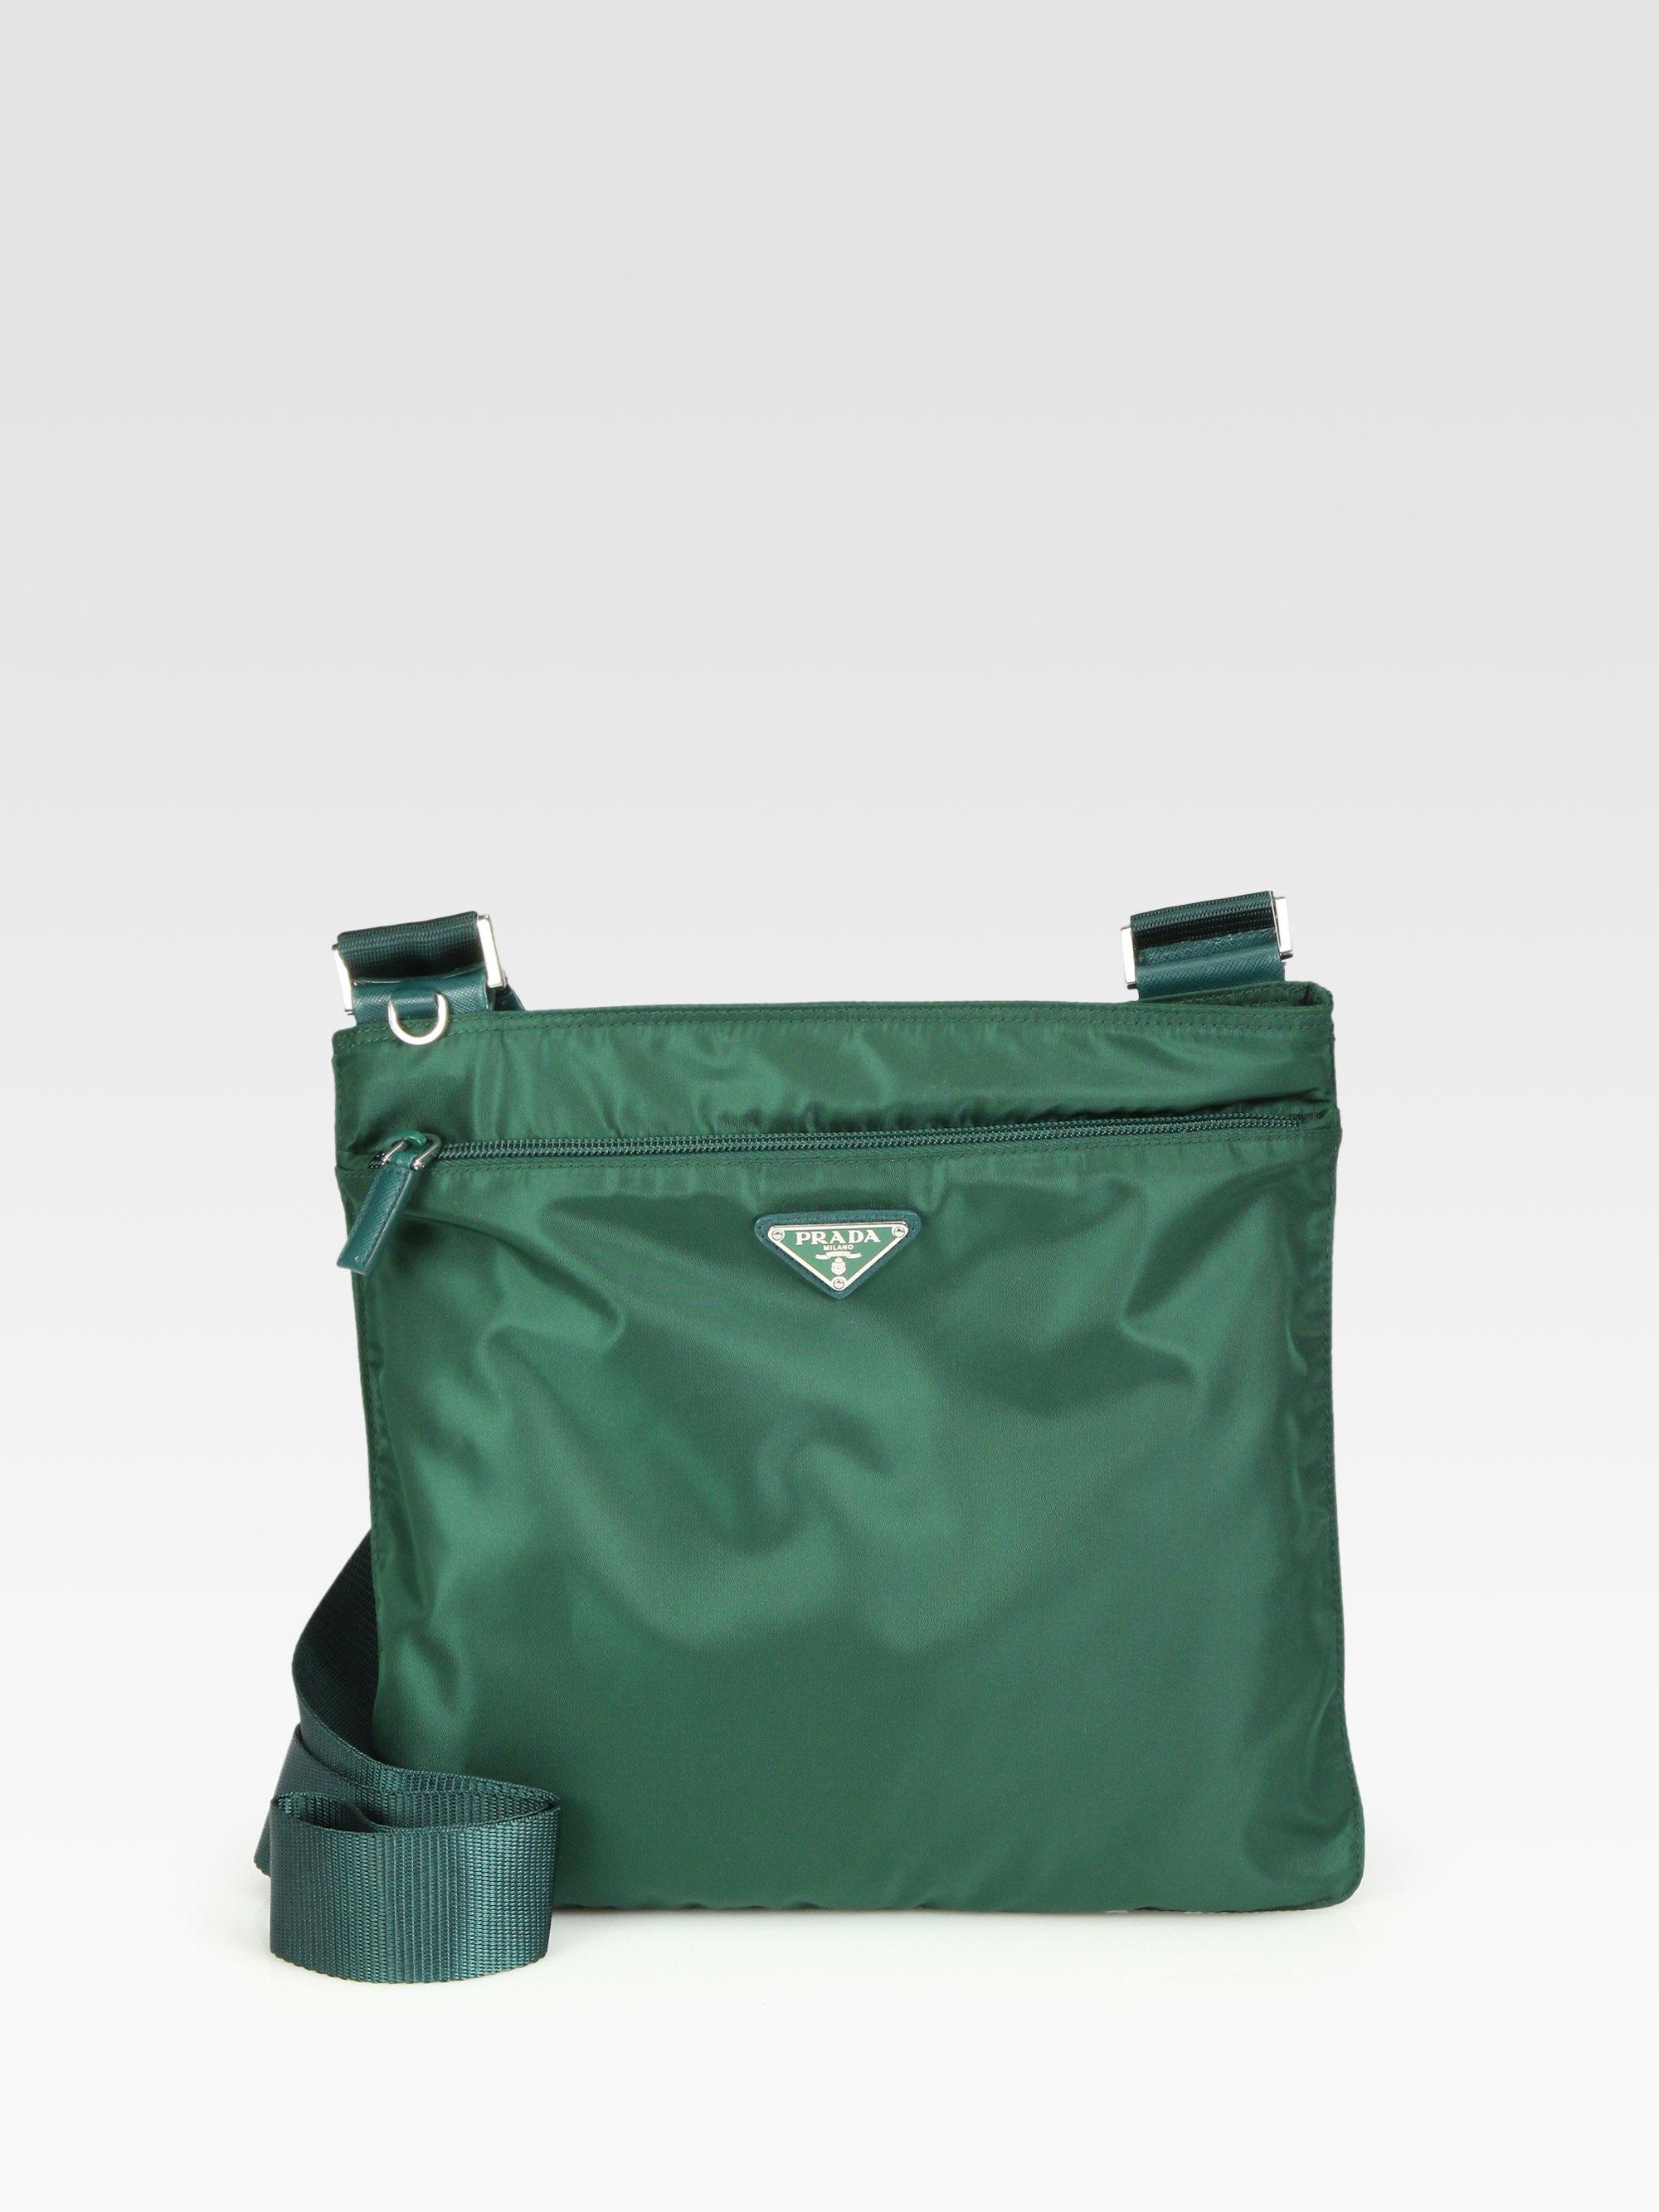 445b7ba1313d ... low cost lyst prada vela medium flat messenger in green b6412 d3c15